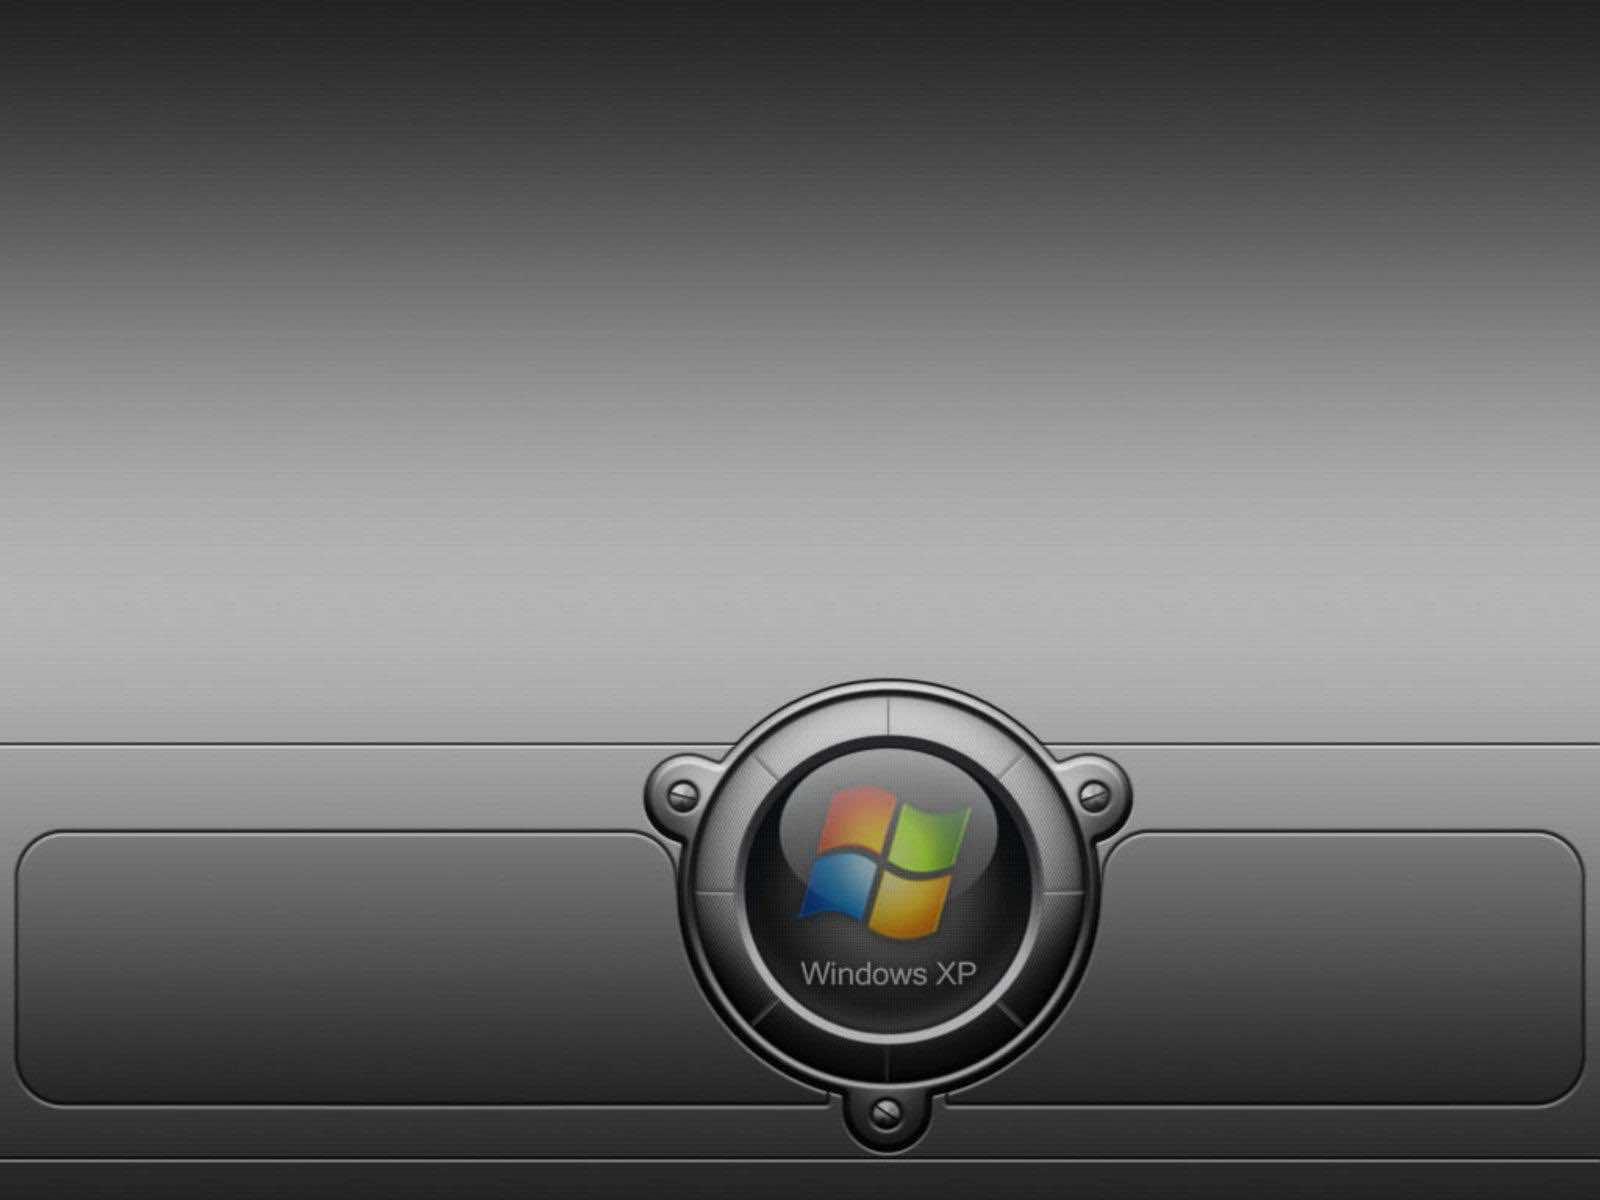 Windows XP wallpapers 15